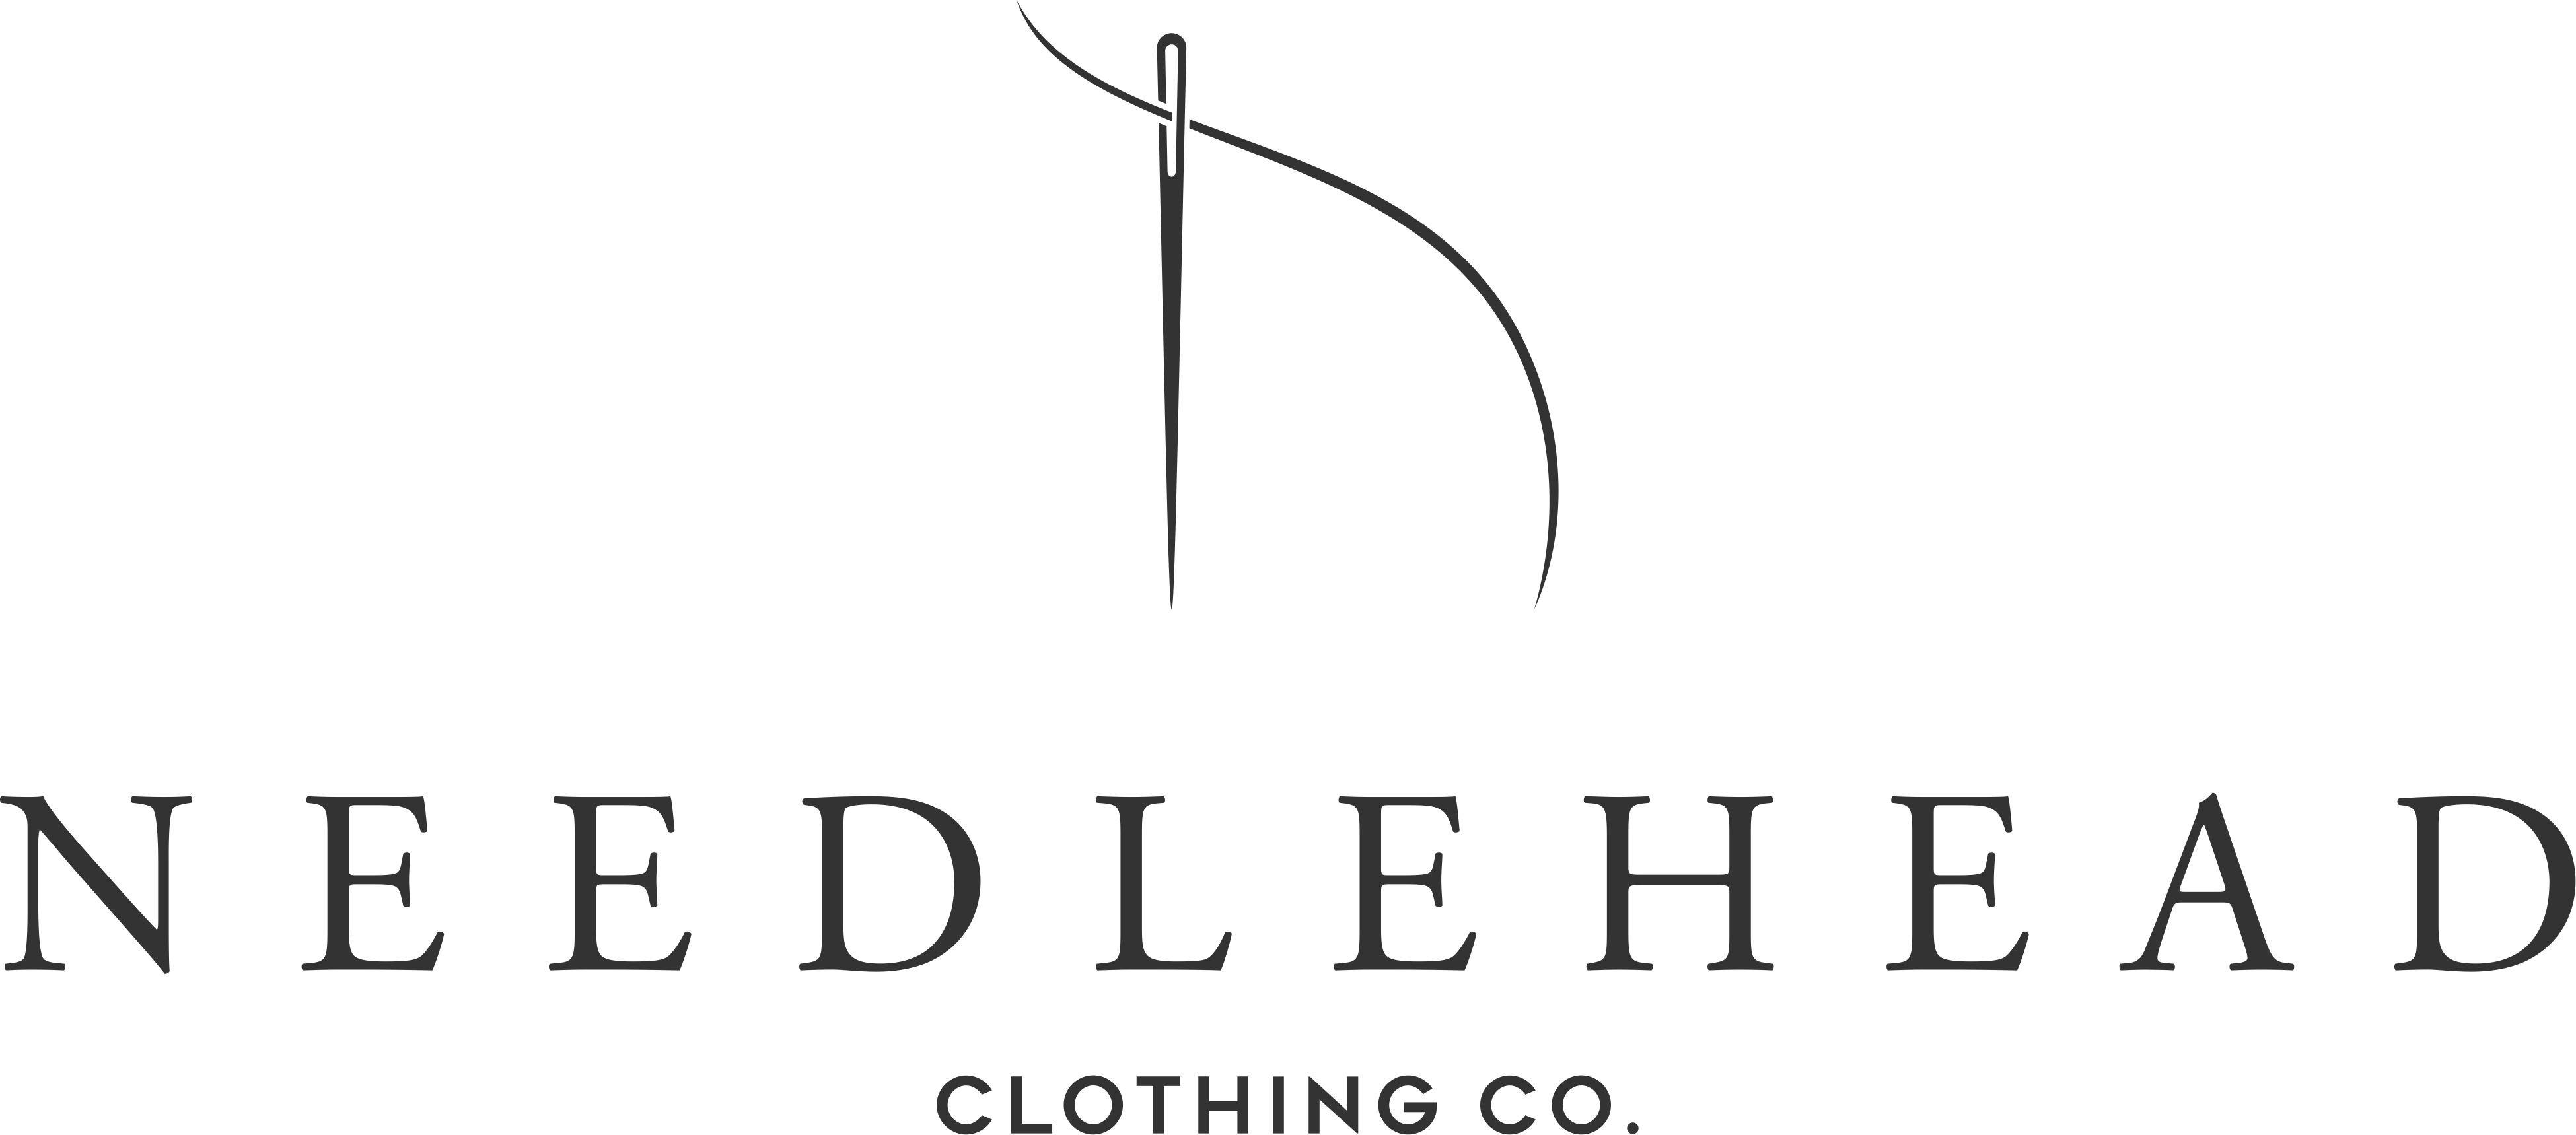 custom clothing and footwear company needs a logo